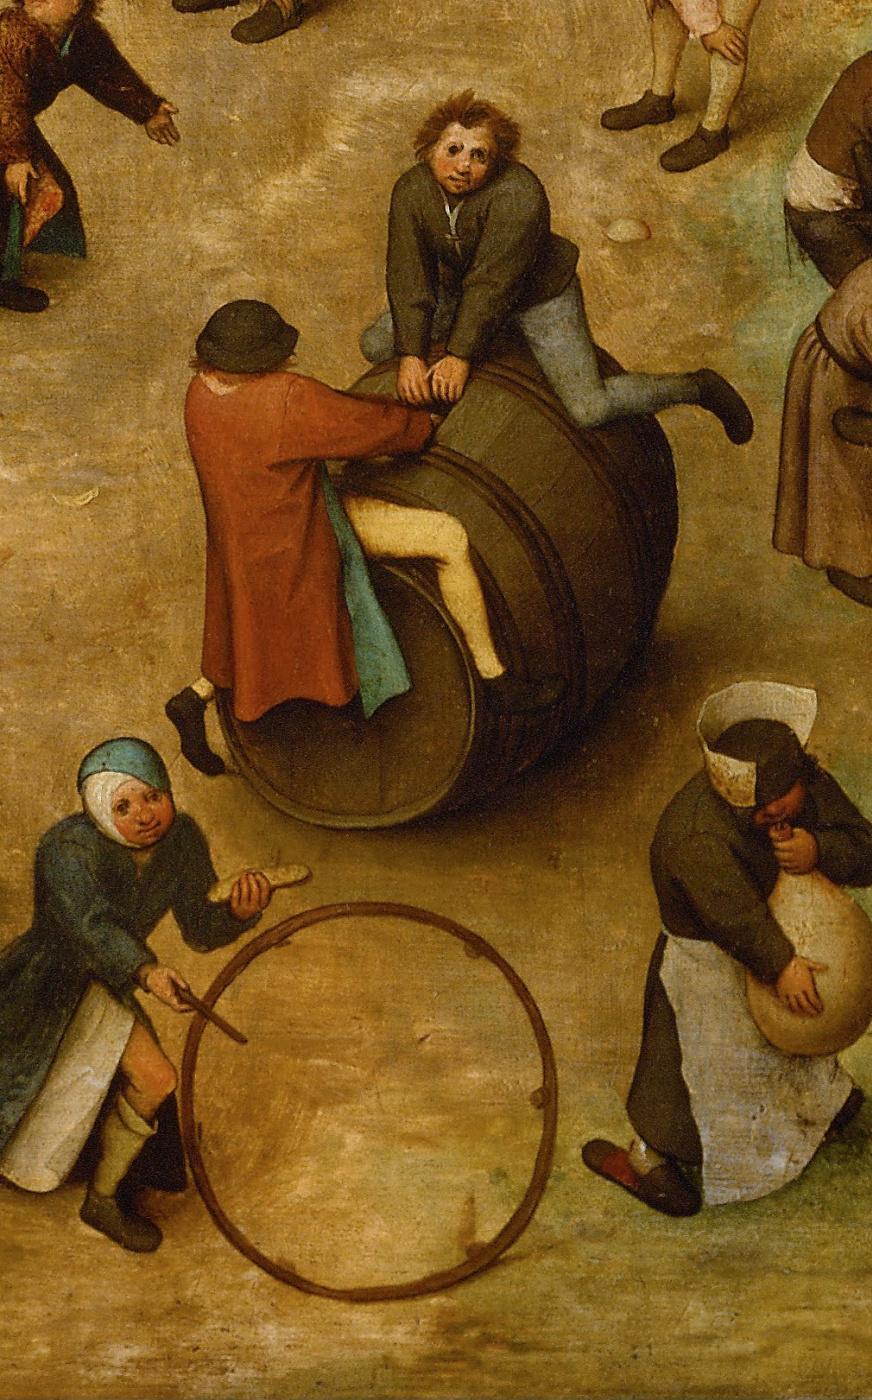 Pieter Bruegel The Elder. Children's games. Fragment 17